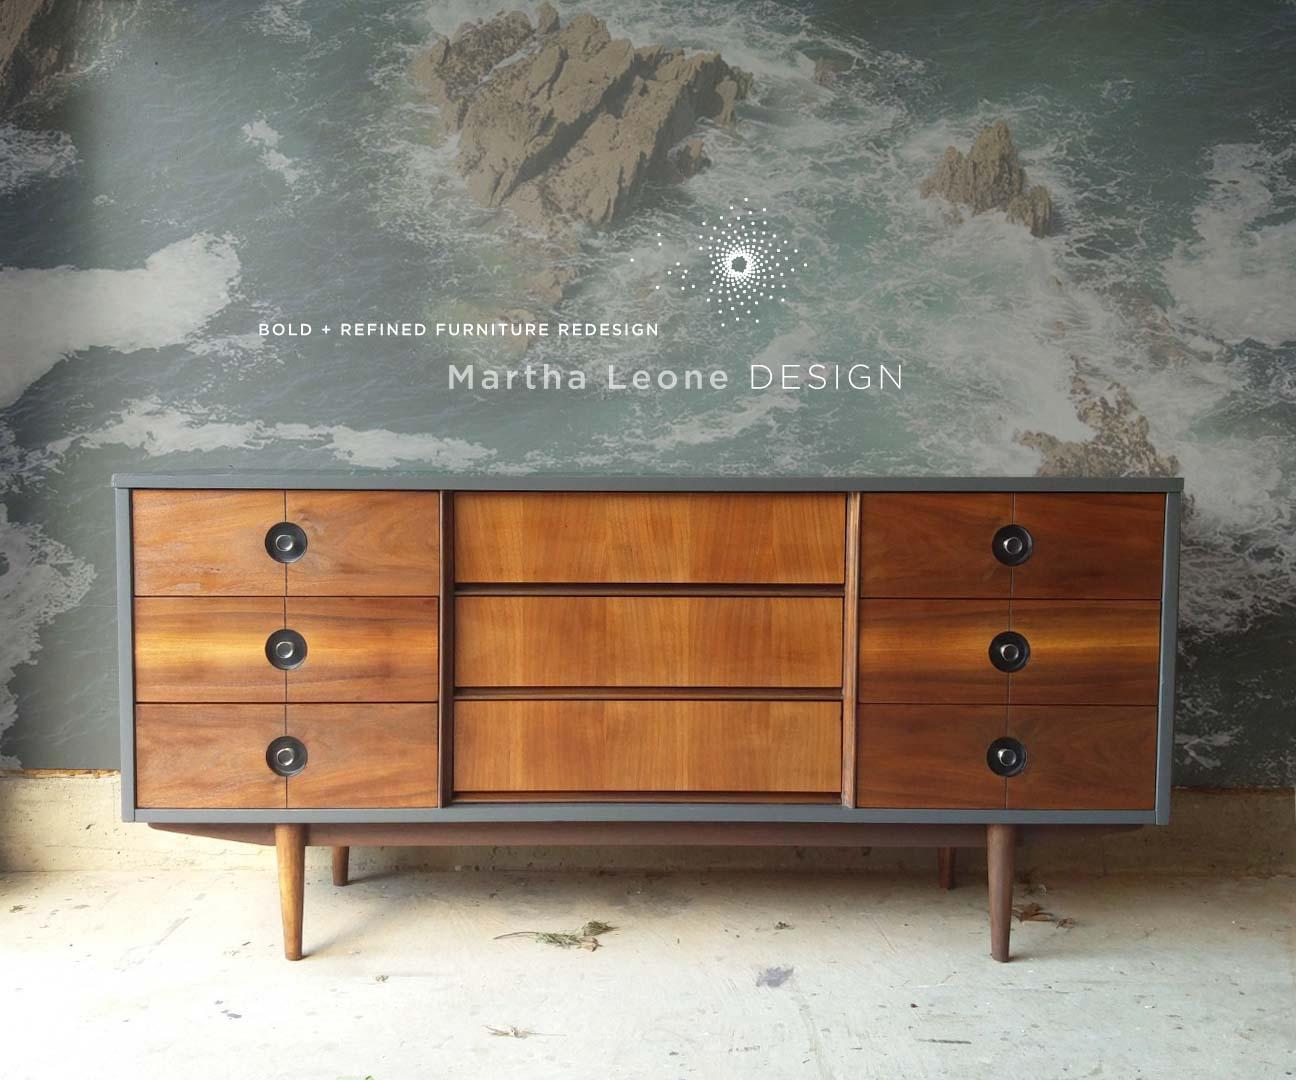 MCMA Martha Leone Design.jpg